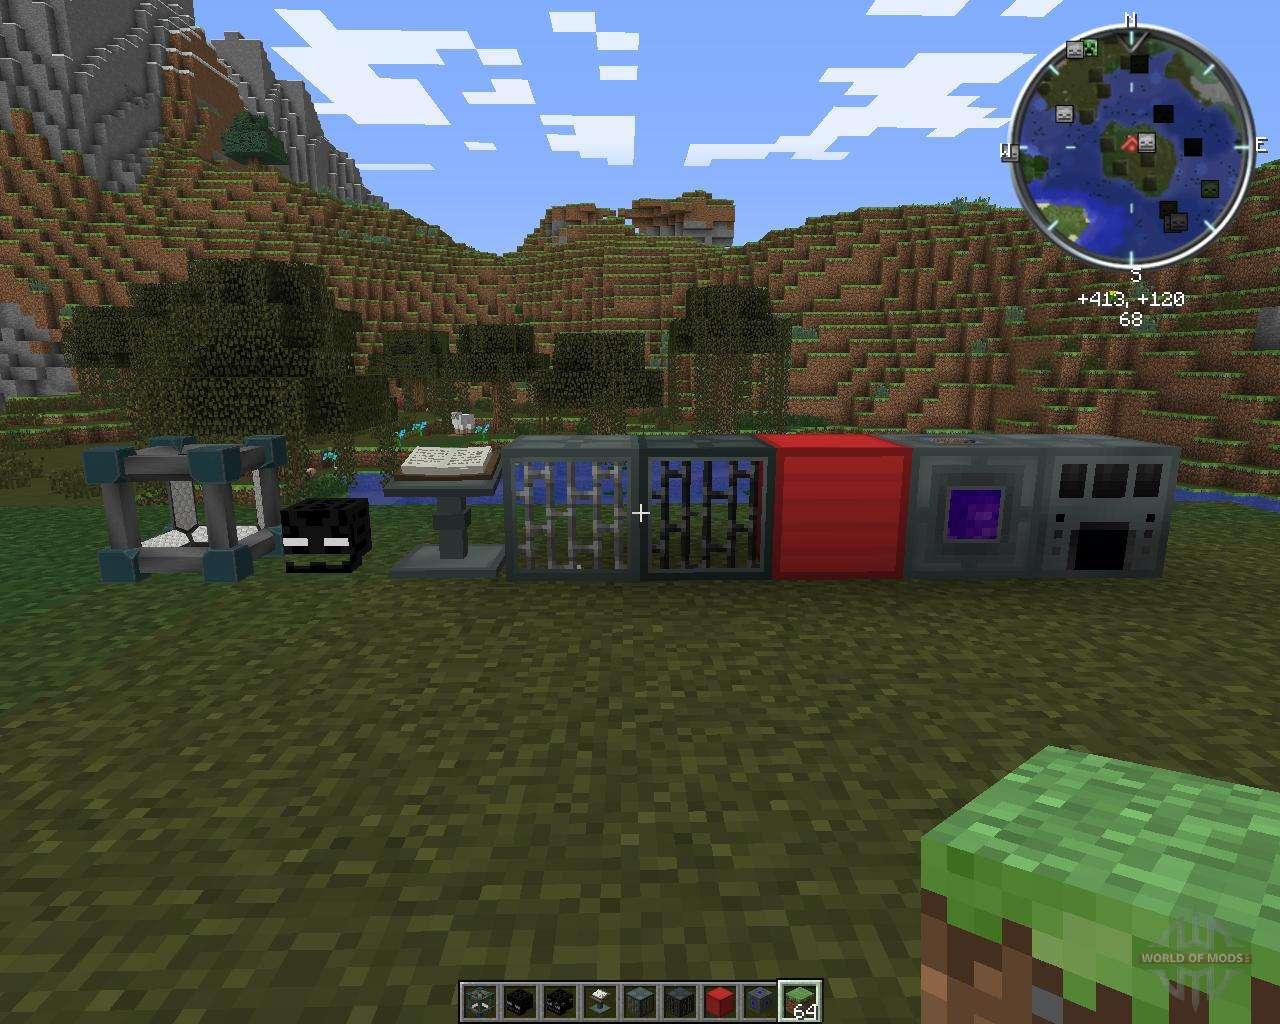 Minecraft ender io tutorial